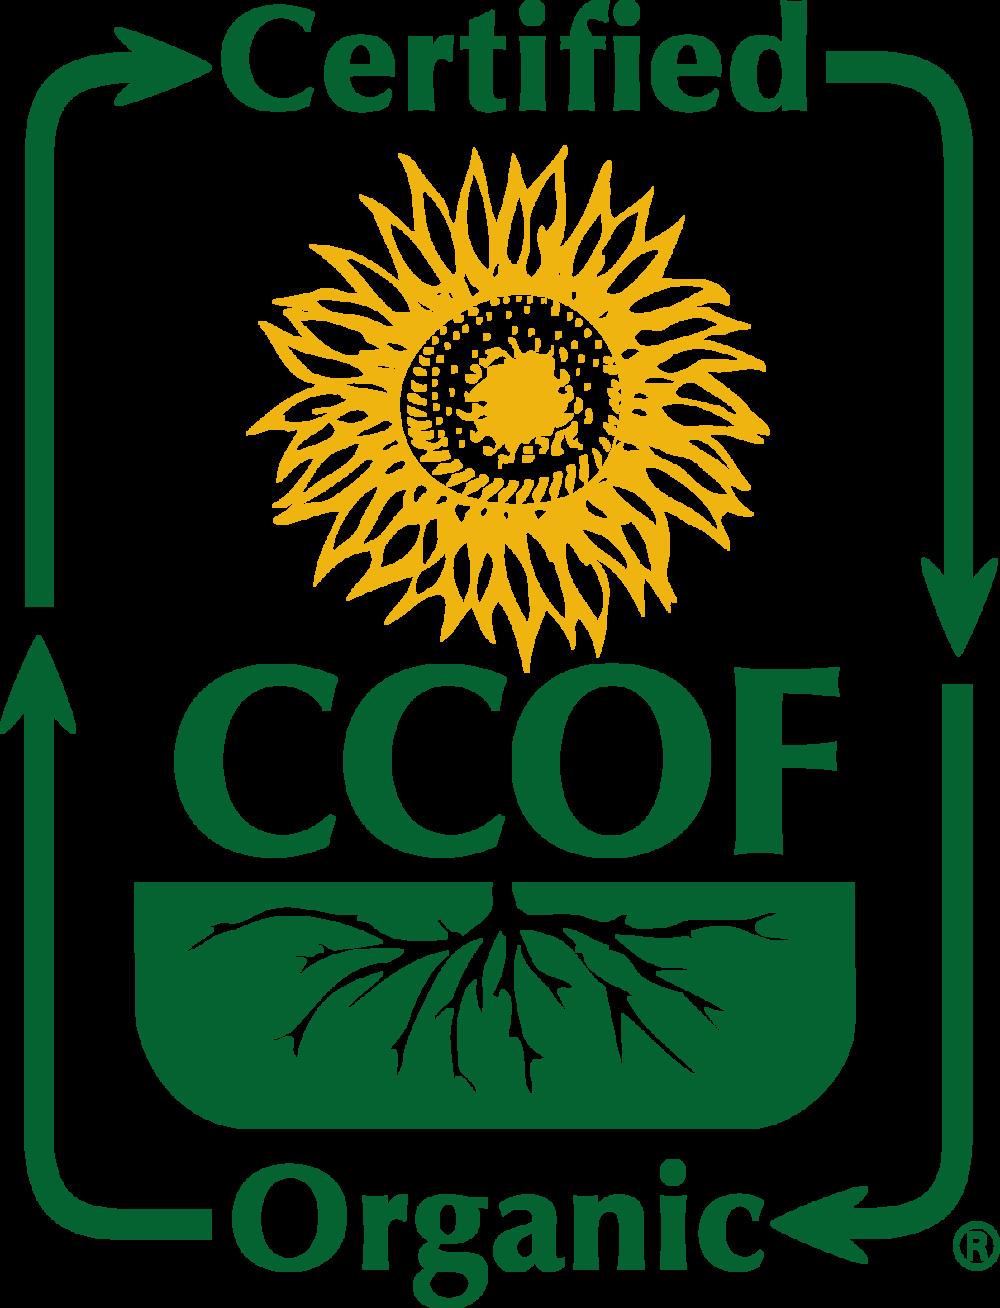 Cerified CCOF Organic